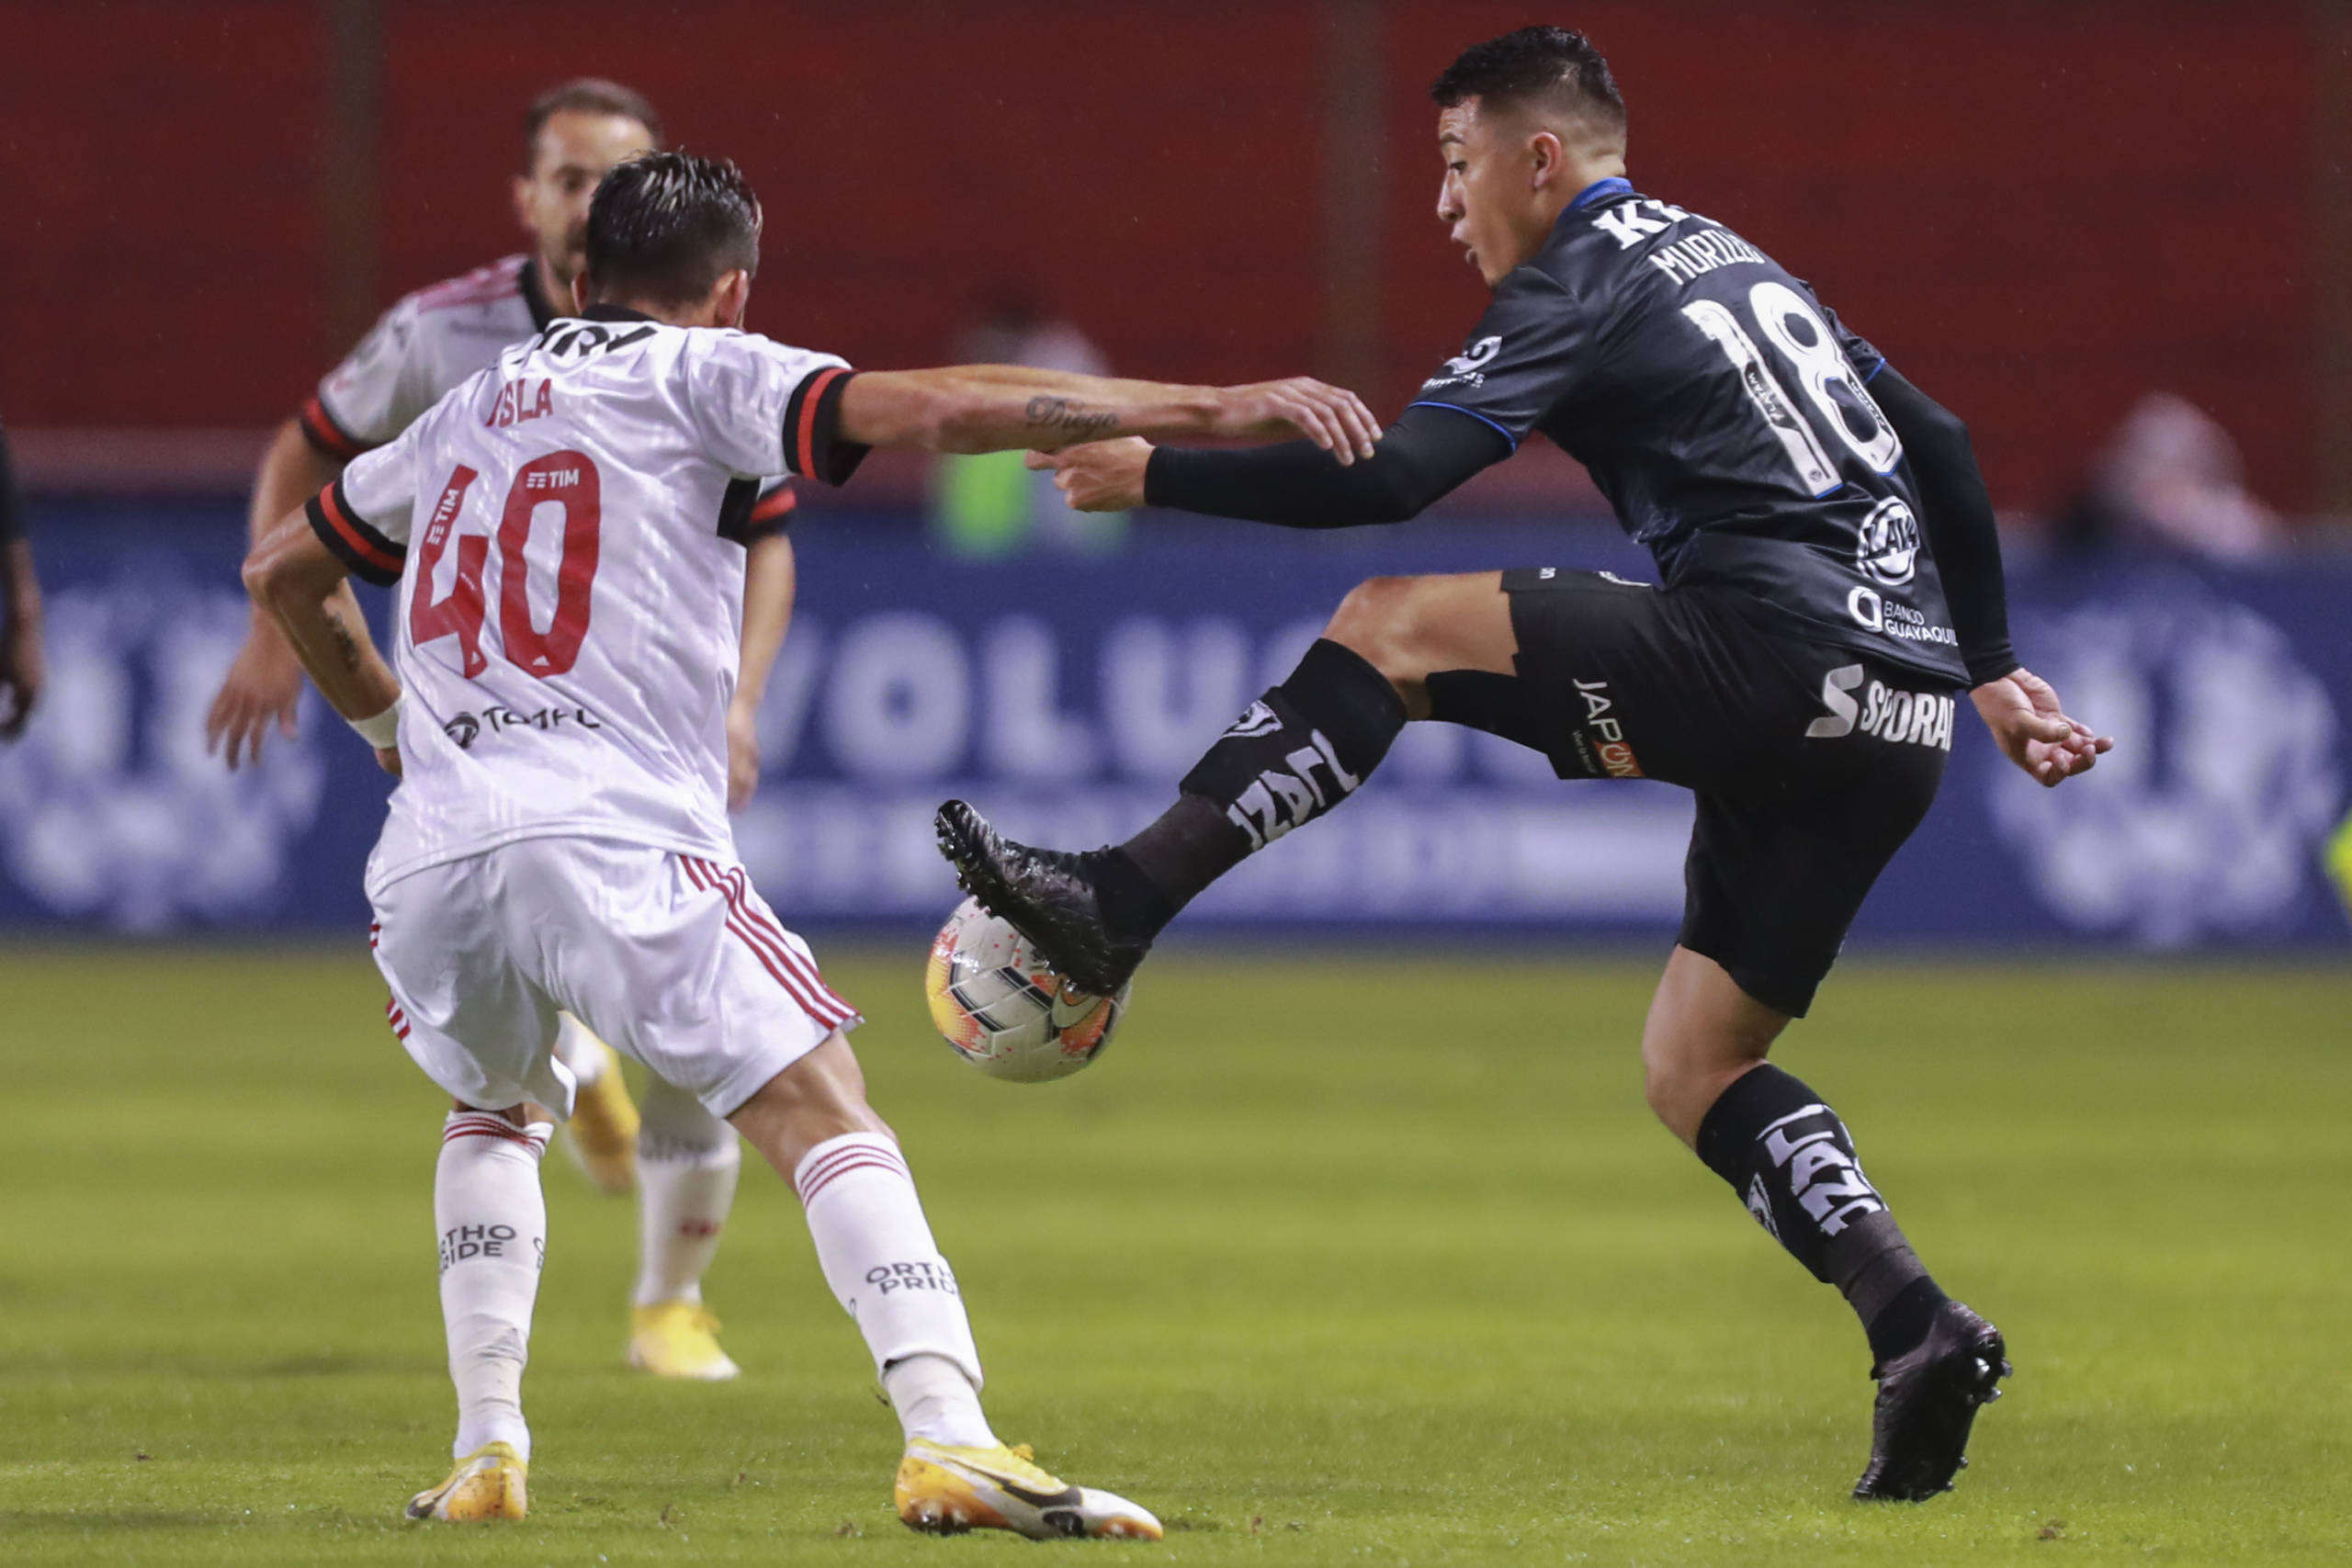 Isla reconhece superioridade do Del Valle após derrota do Flamengo